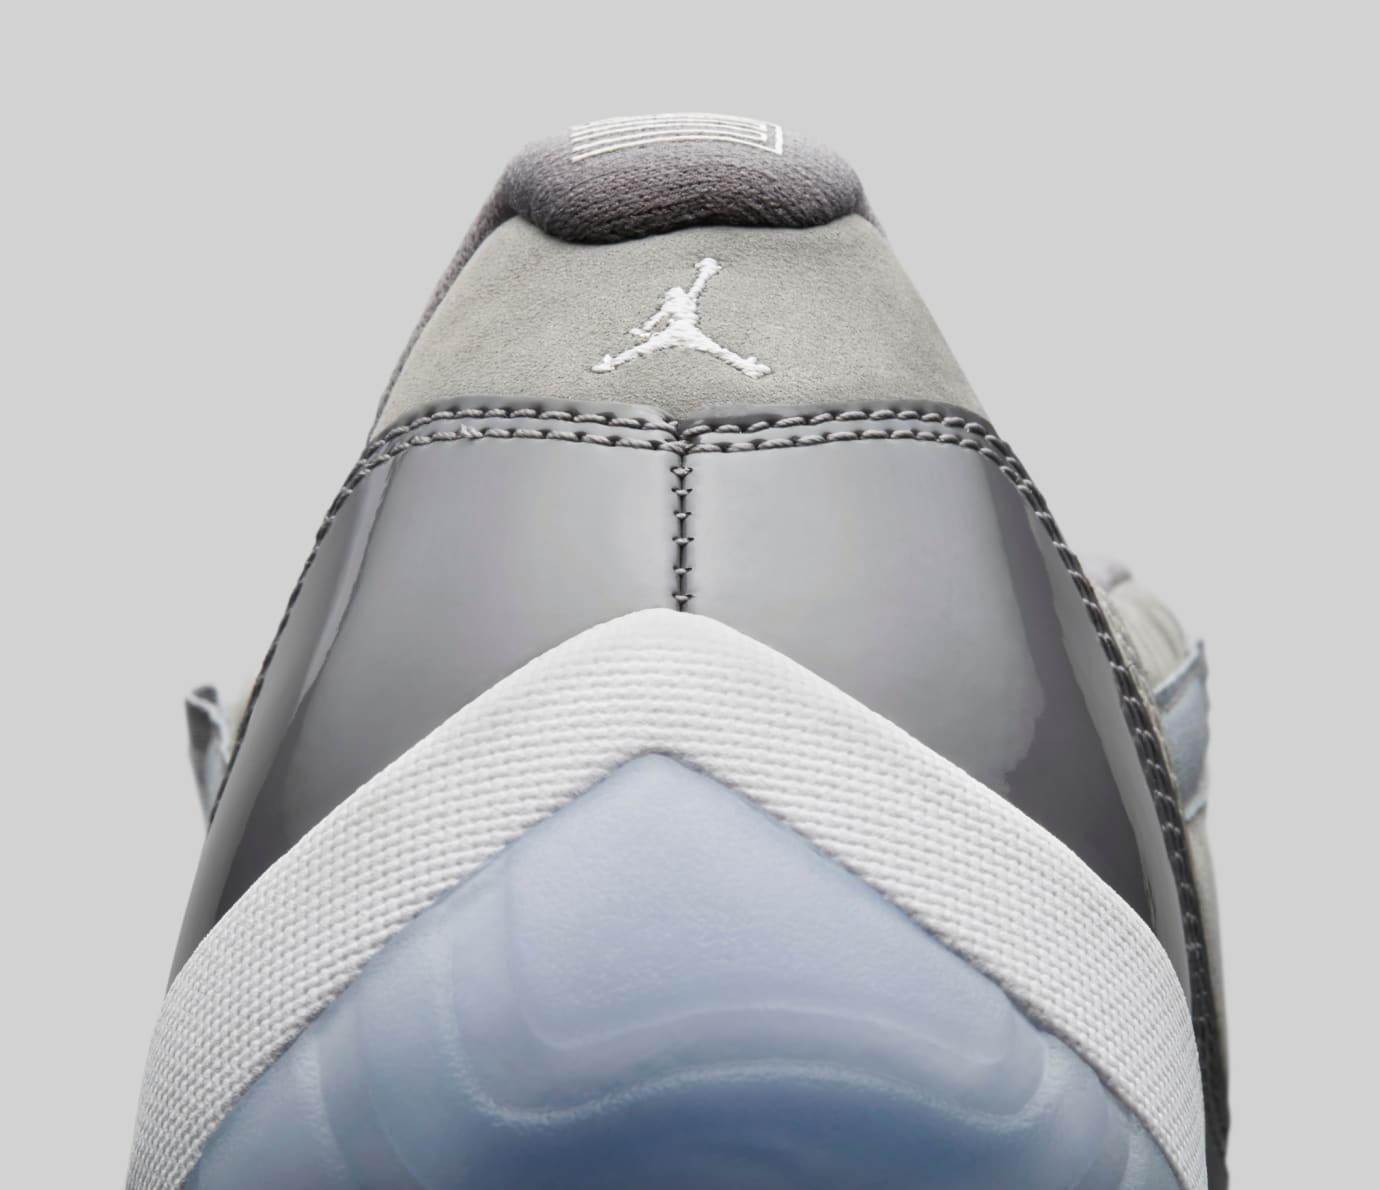 a6921f4ebaaa85 Air Jordan 11 XI Low Cool Grey 2018 Release Date 528895-003